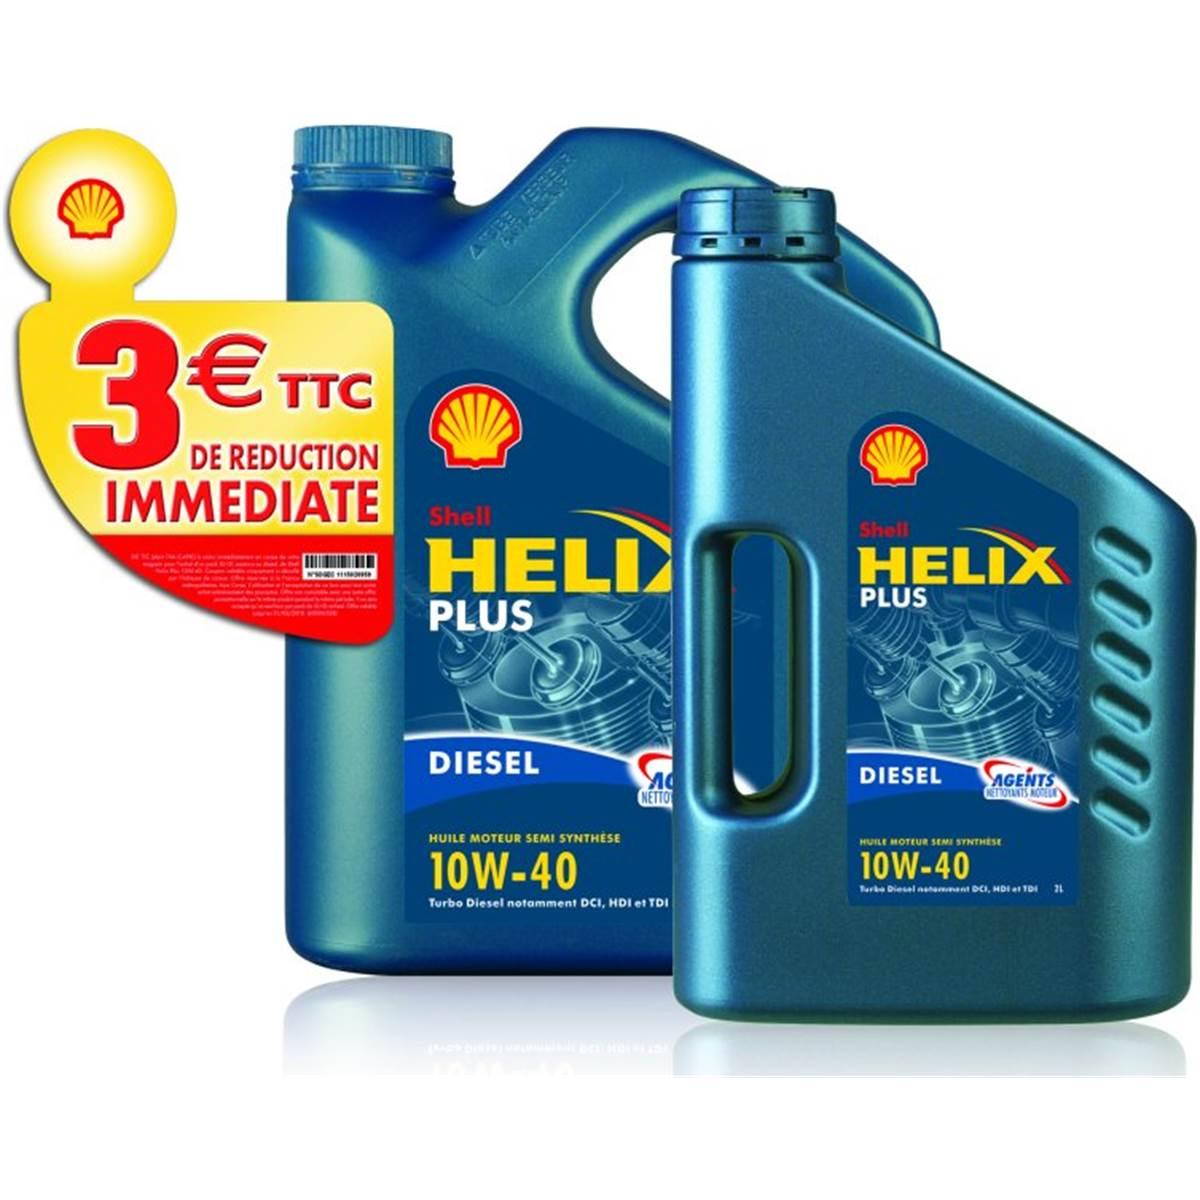 Huile semi-synthèse Shell Helix Plus Essence 10W40 5L + 2L